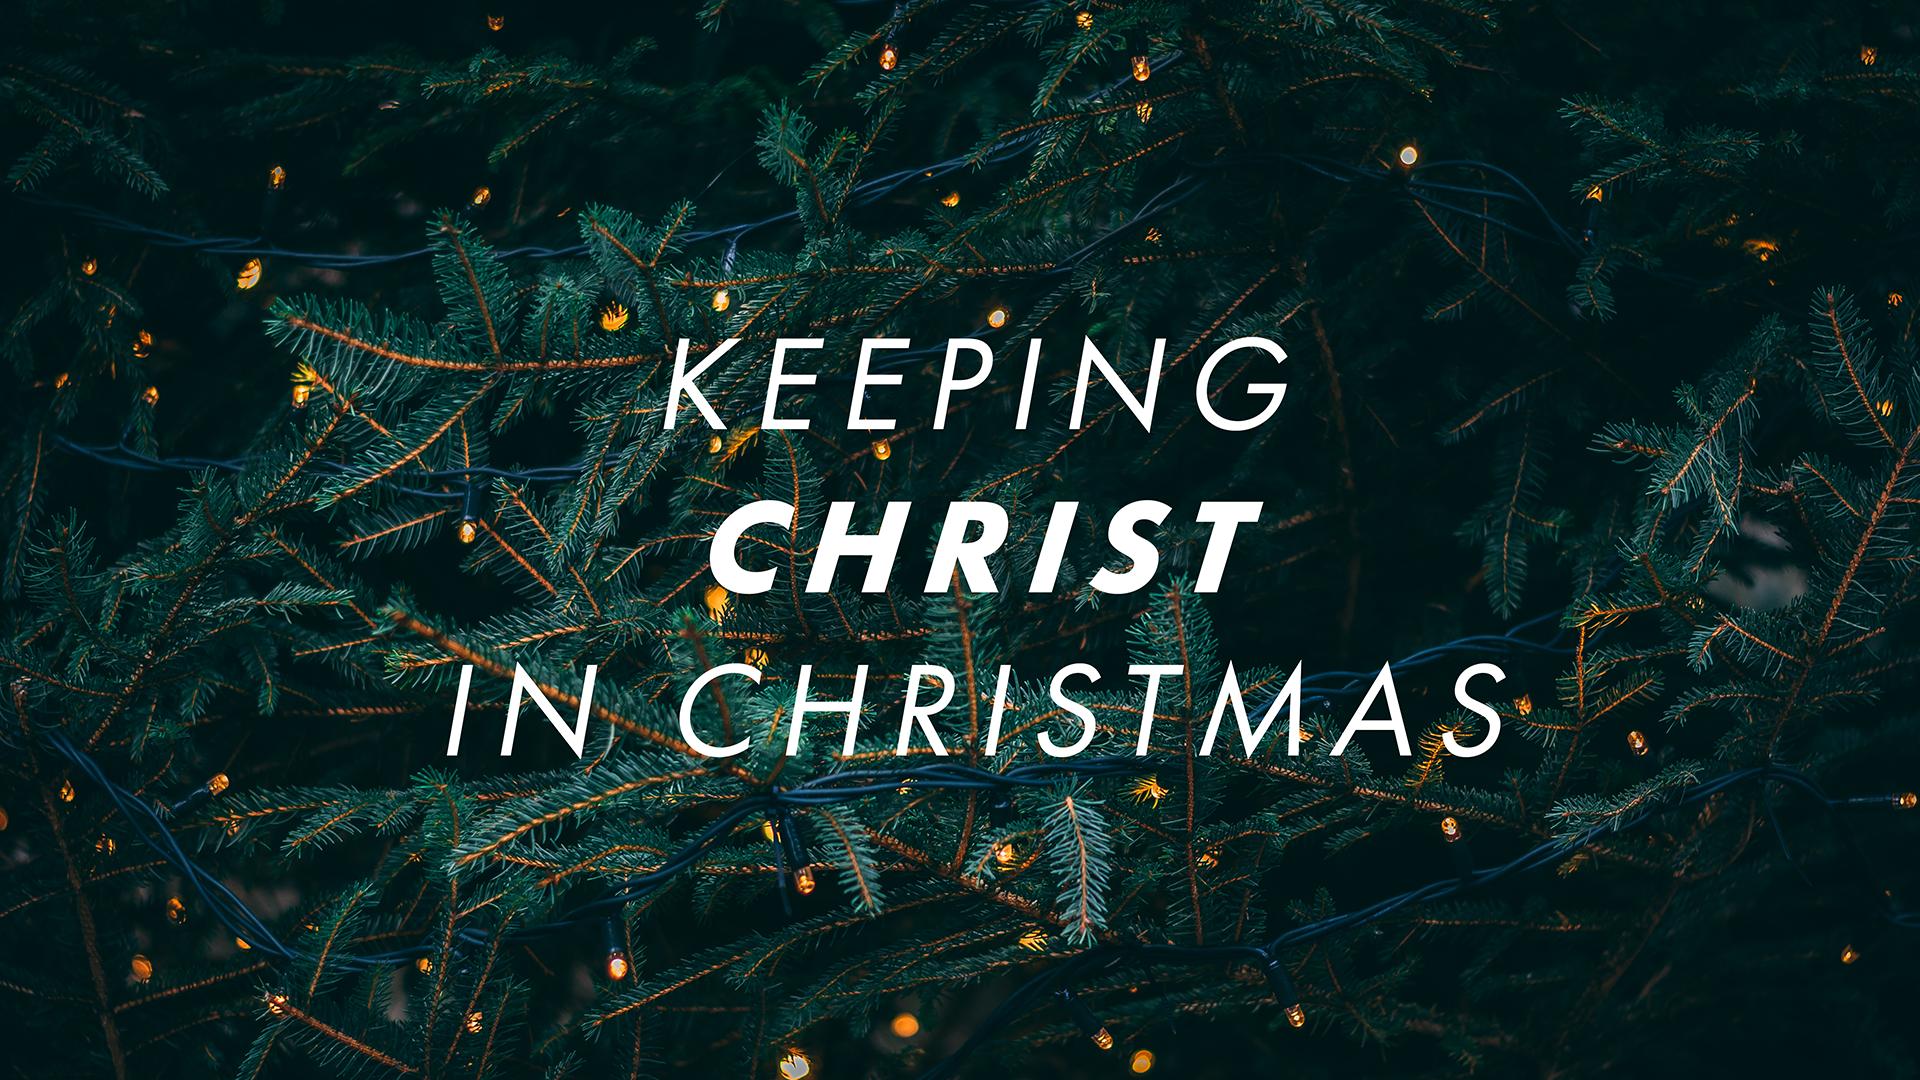 Christ In Christmas.Keeping Christ In Christmas Week 4 Enjoying The Kingdom